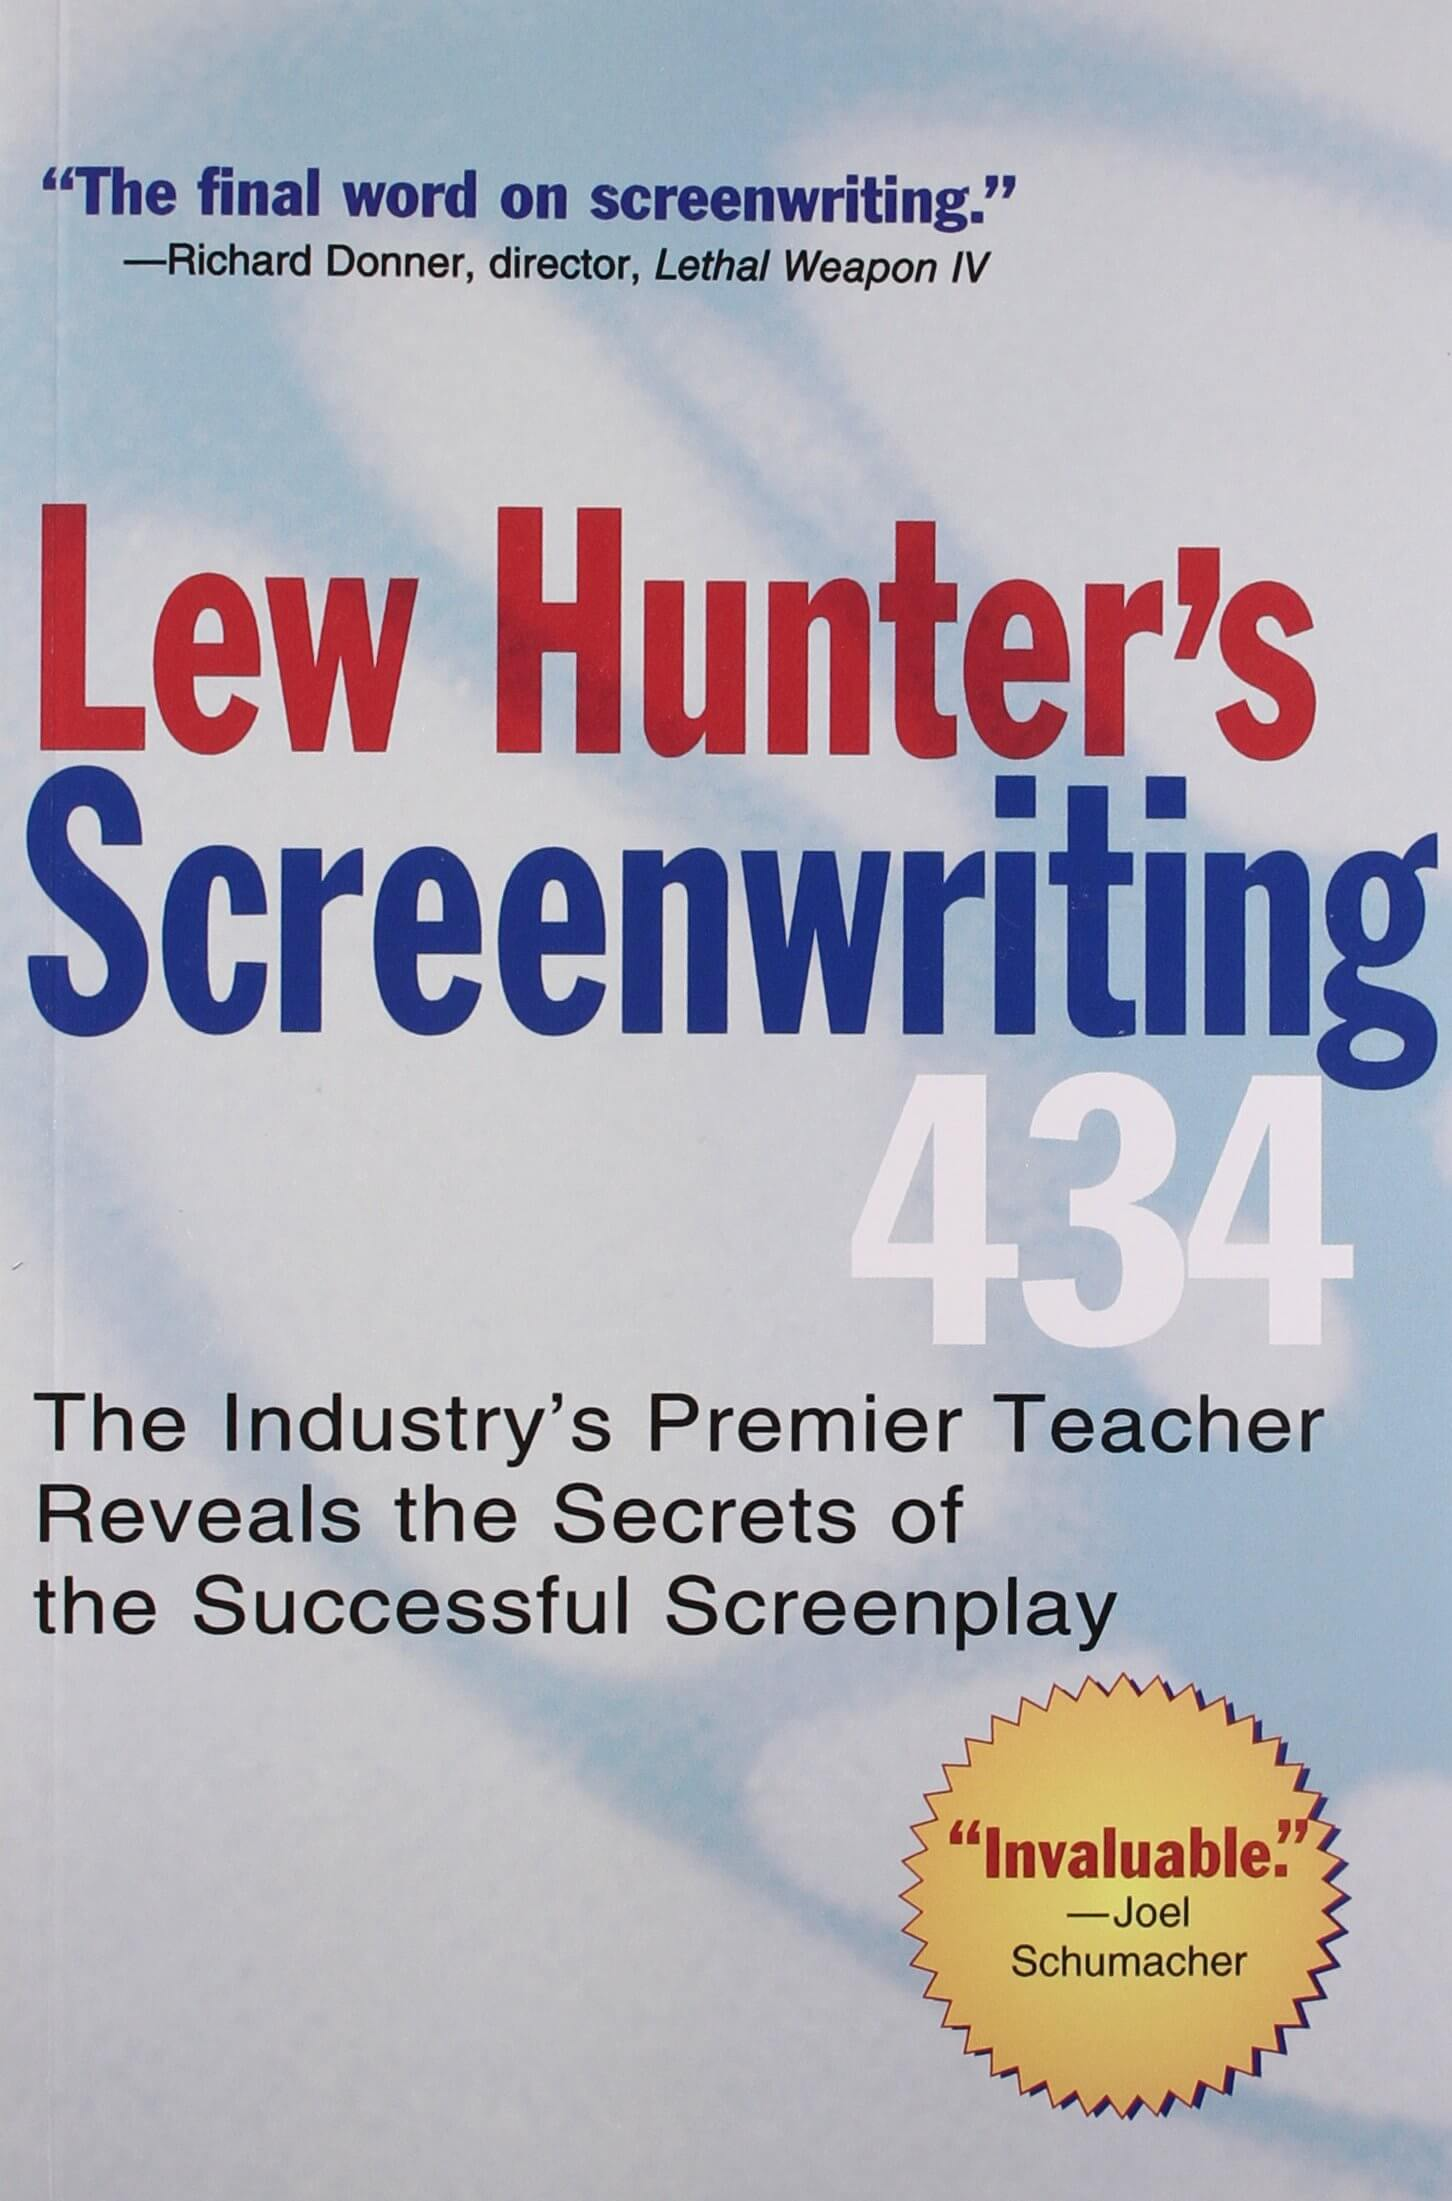 The Best Screenwriting Books for Screenwriters - Lew Hunter's Screenwriting 434-min